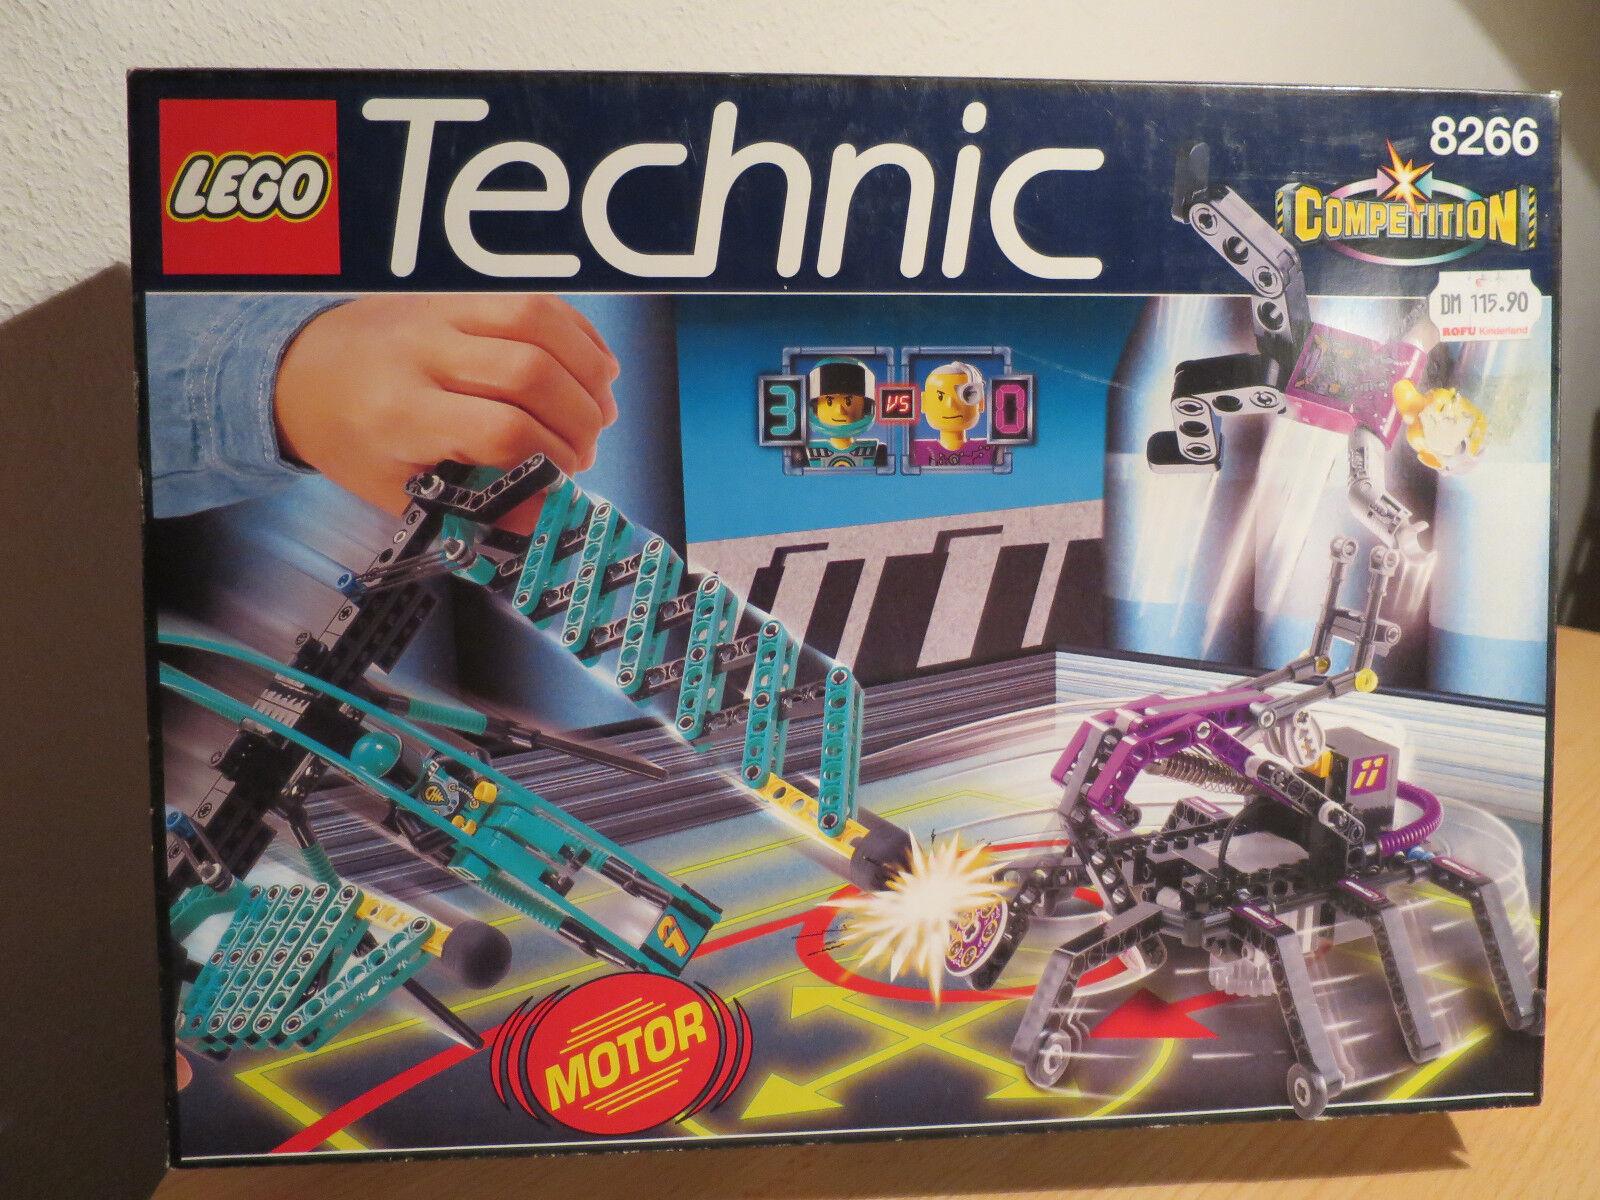 (TB) LEGO LEGO LEGO 8266 NEU OVP MIT MOTOR TOP ZUSTAND ORIGINAL 7bce5e